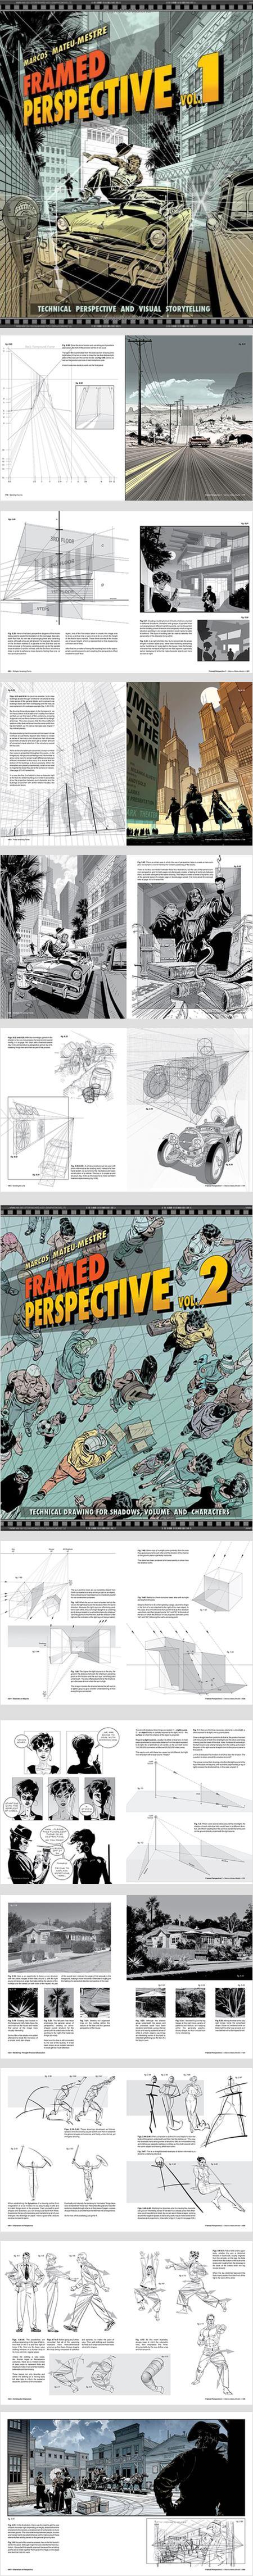 Framed Perspective,  Marcos Mateu-Mestre